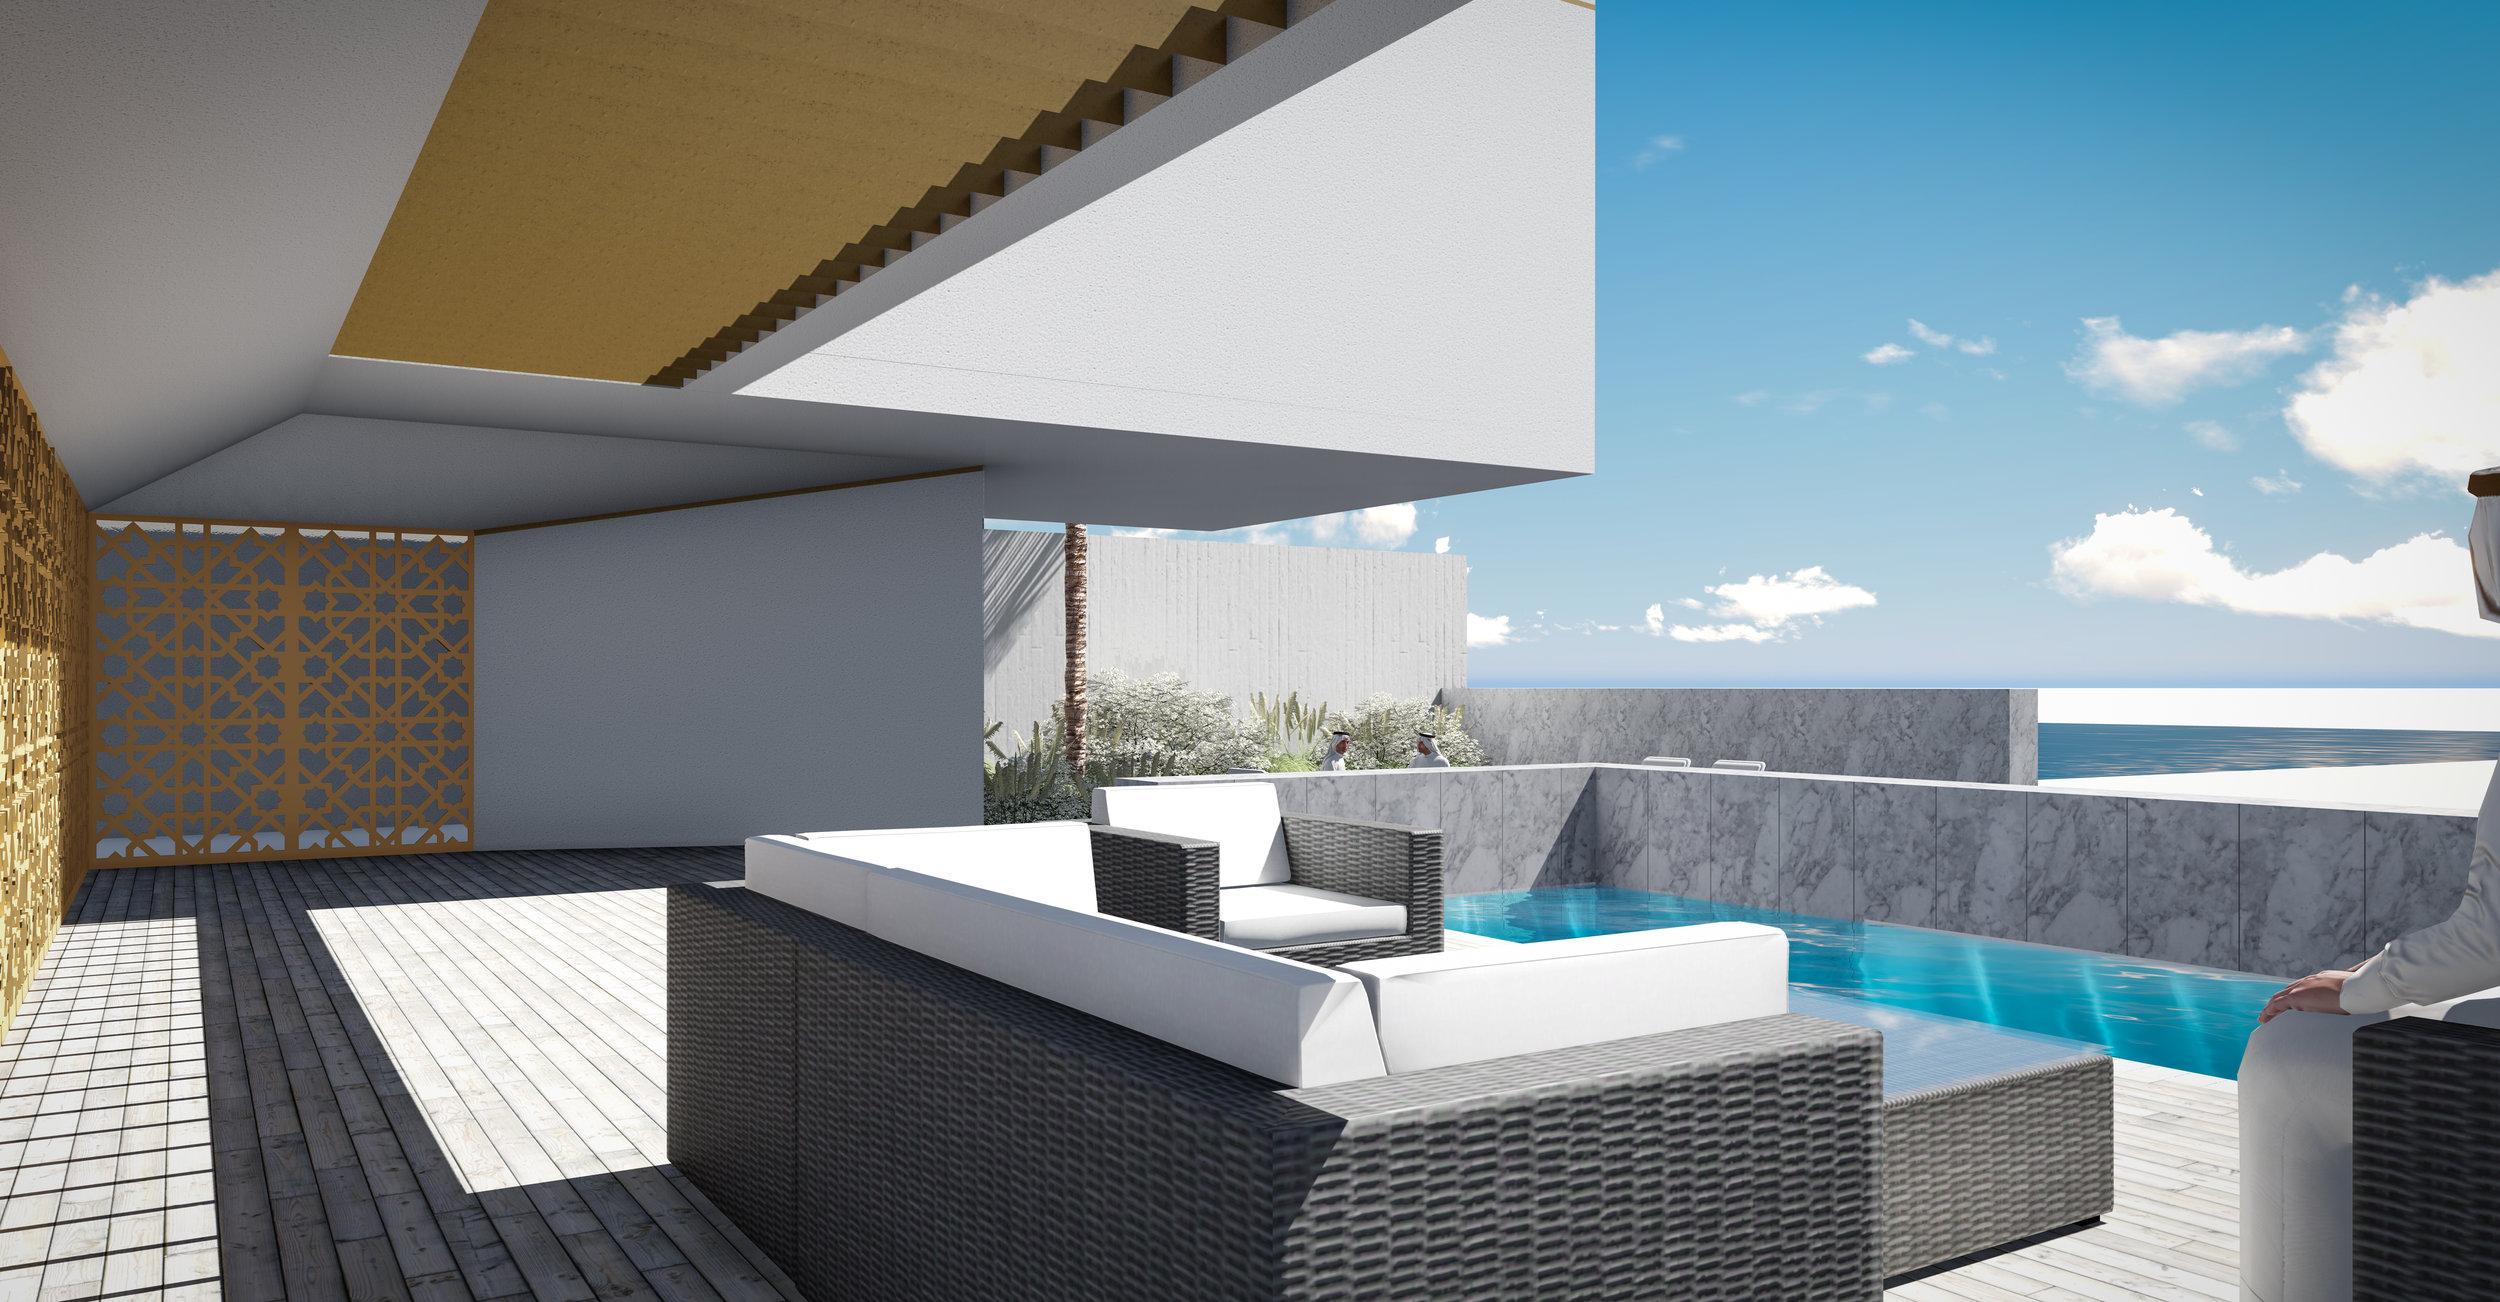 © Copyright Studio DS 2018 - the Beach Villa Terrace View